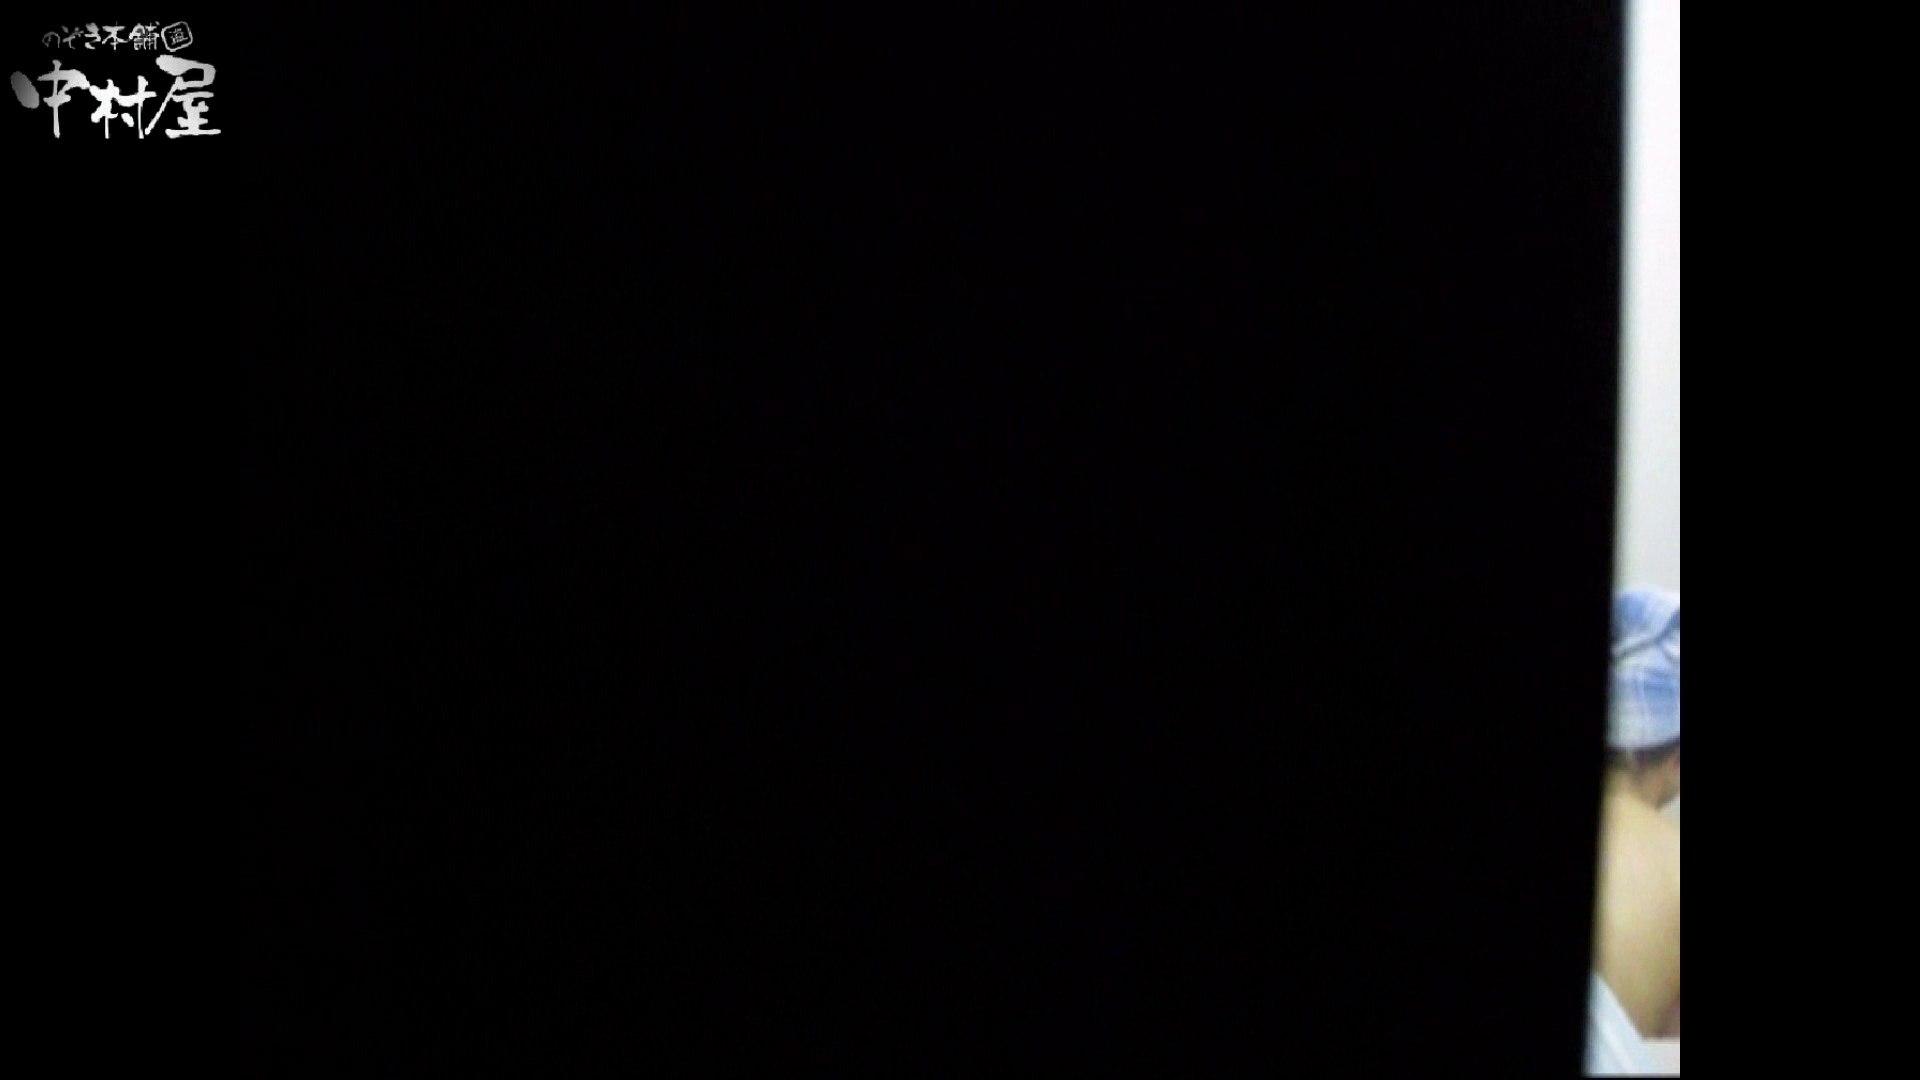 民家風呂専門盗撮師の超危険映像 vol.002 リアル股間  109Pix 48